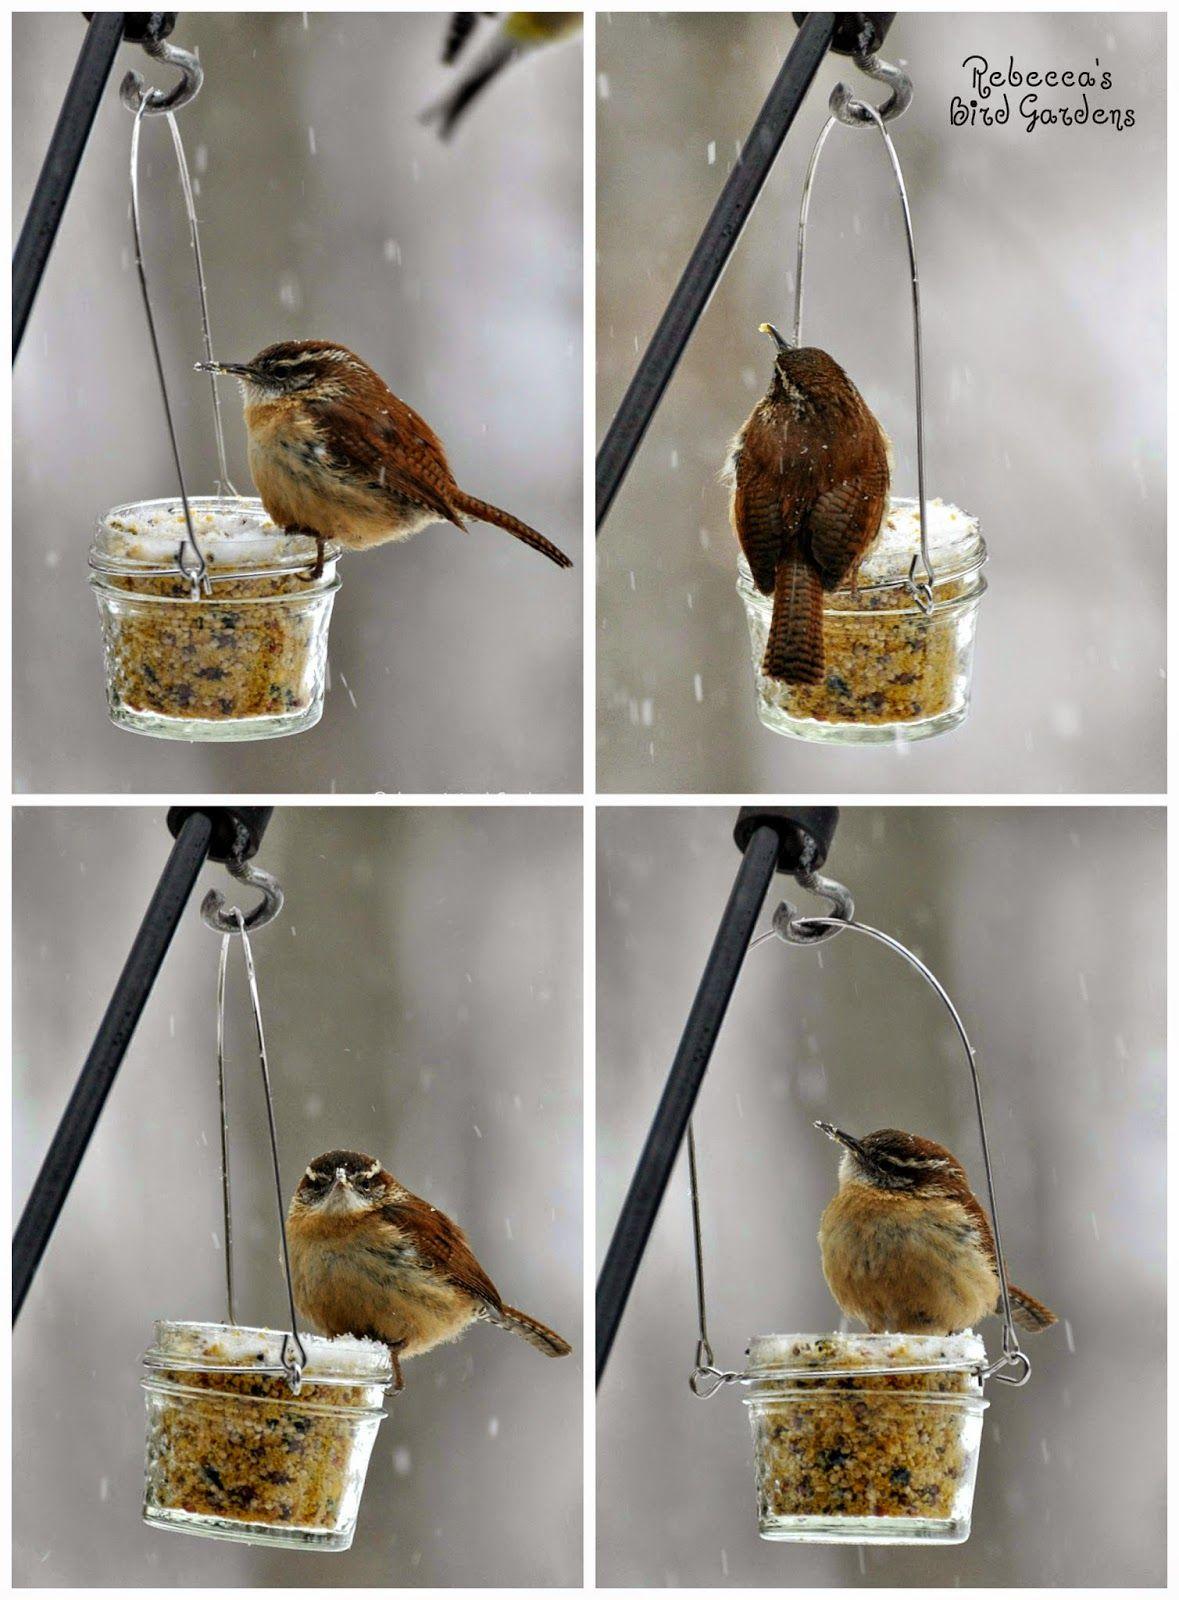 Rebecca 39 s bird gardens blog diy mason or jelly jar for Diy birdfeeders